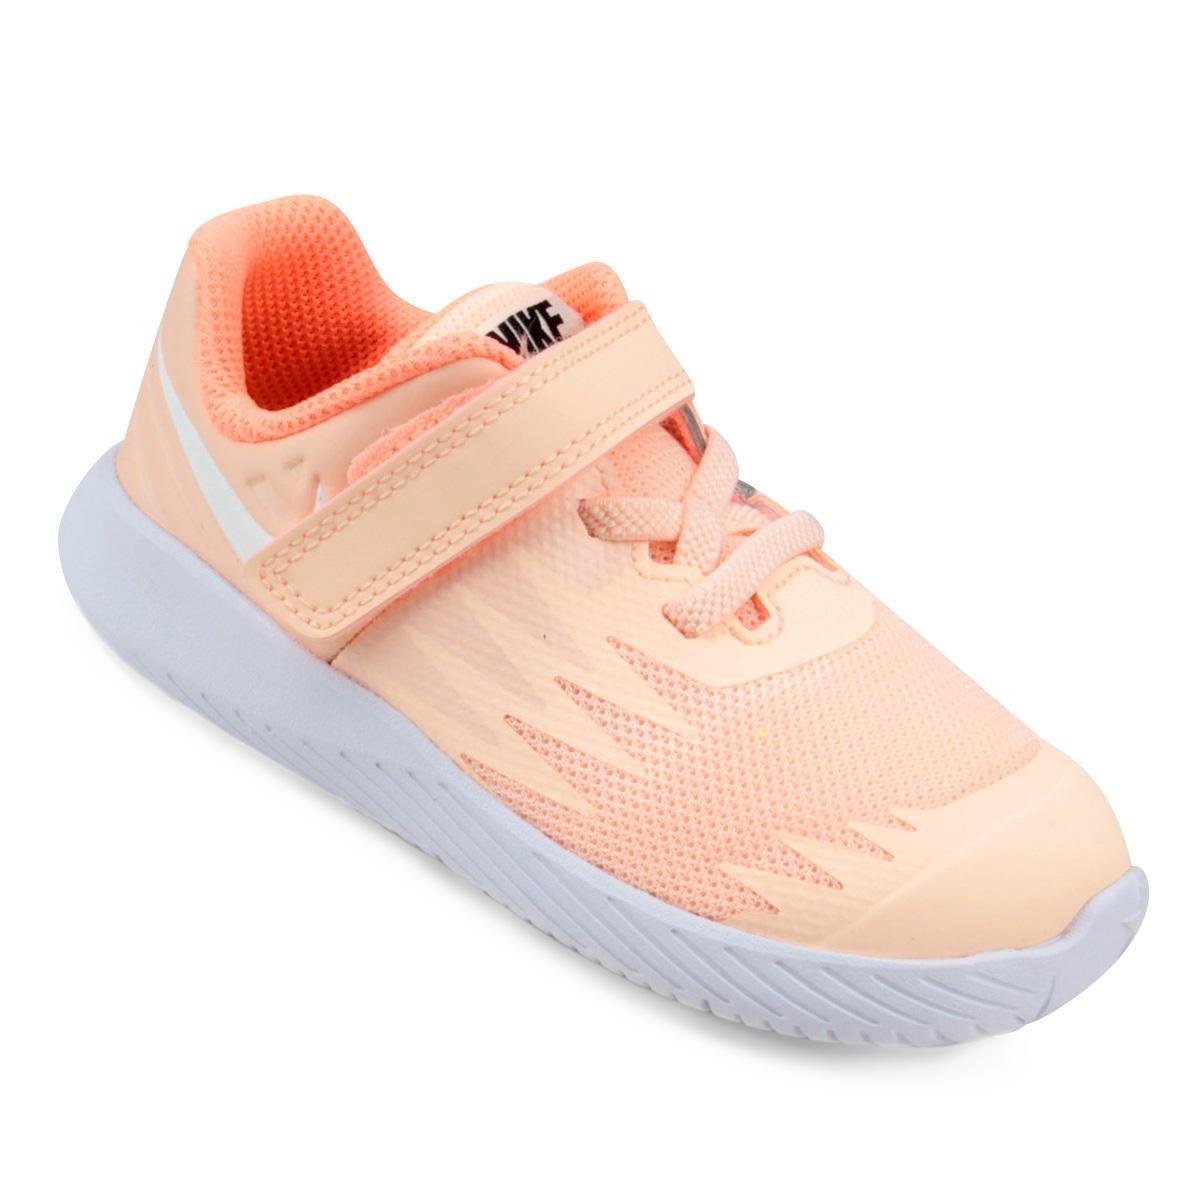 9dc048ce2b Tênis Infantil Nike Star Runner Feminino - Compre Agora